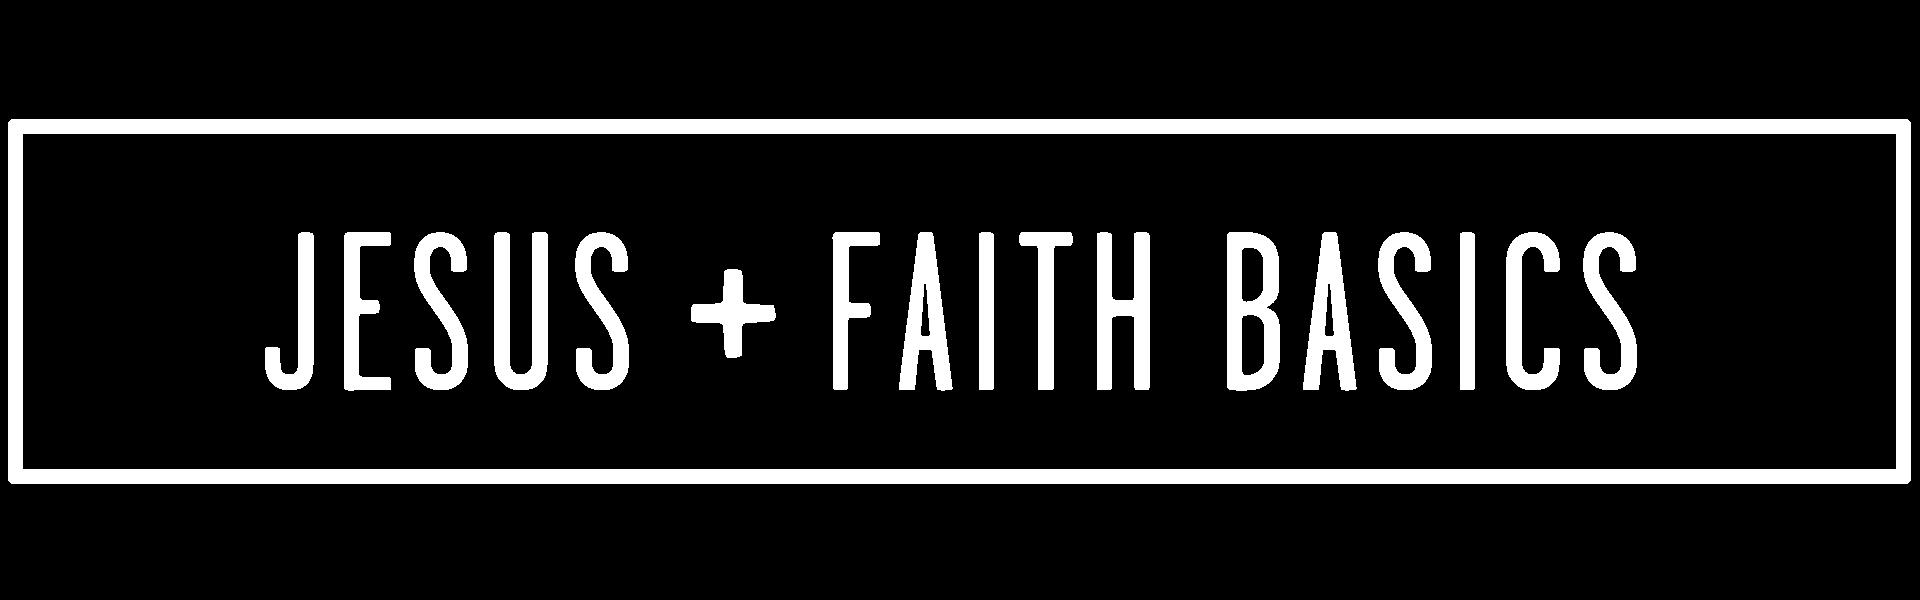 GROUP STUDY PLANS - headers - JESUS + FAITH BASICS.png